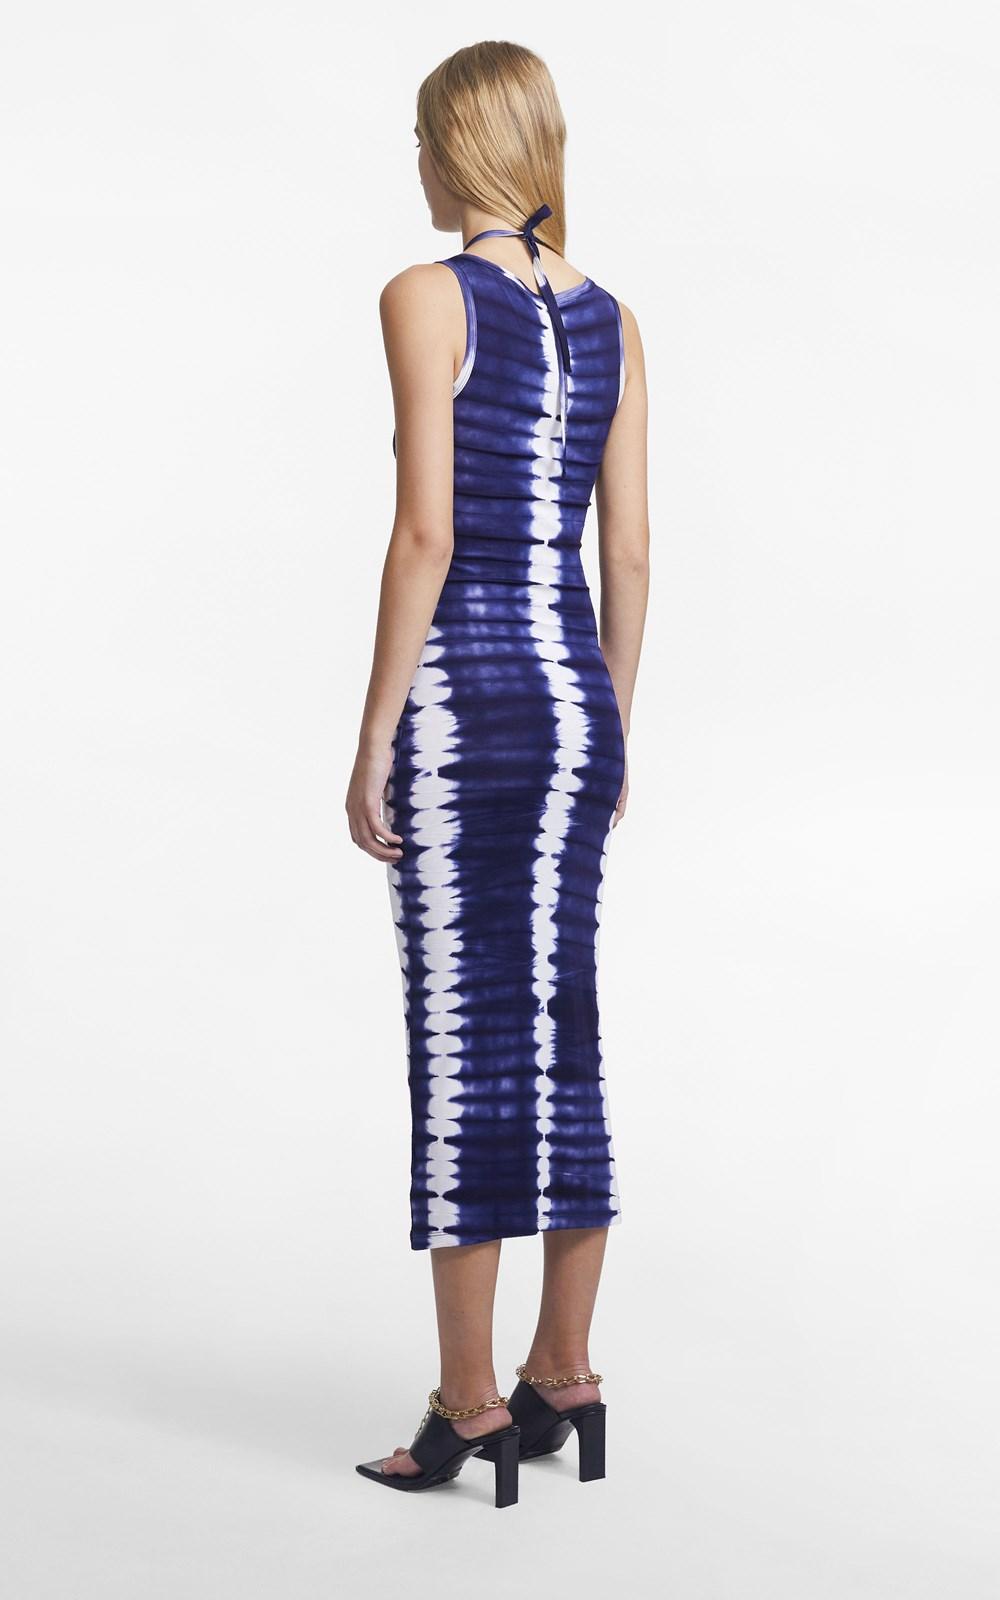 Dresses | HAND DYED SHIBORI HALTER TIE TANK DRESS